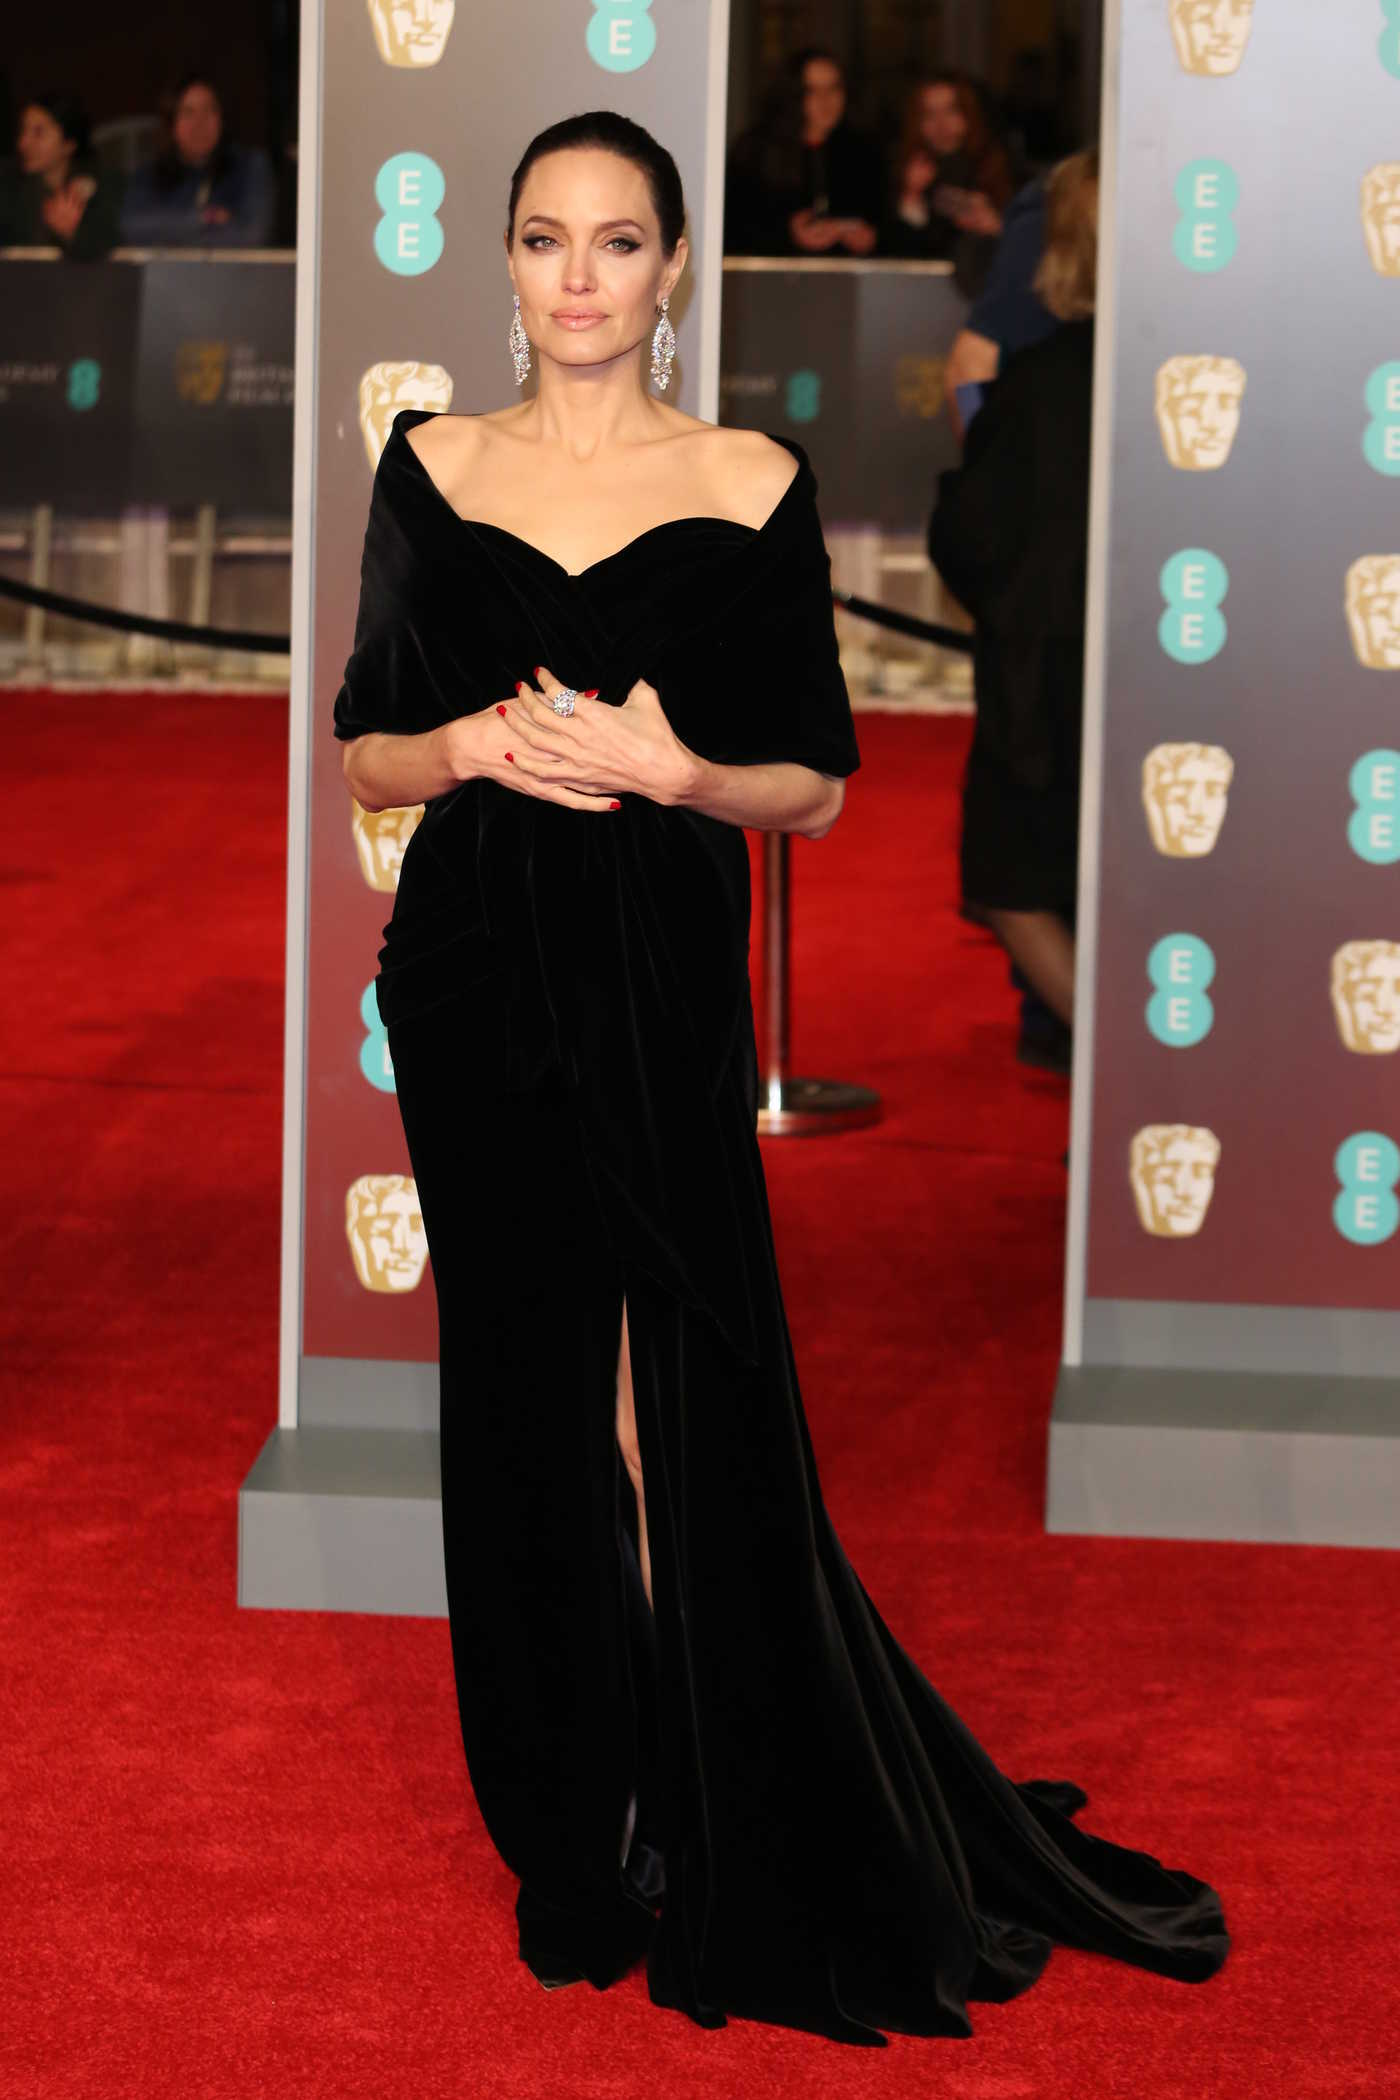 Angelina Jolie at the 71st British Academy Film Awards at Royal Albert Hall in London 02/18/2018